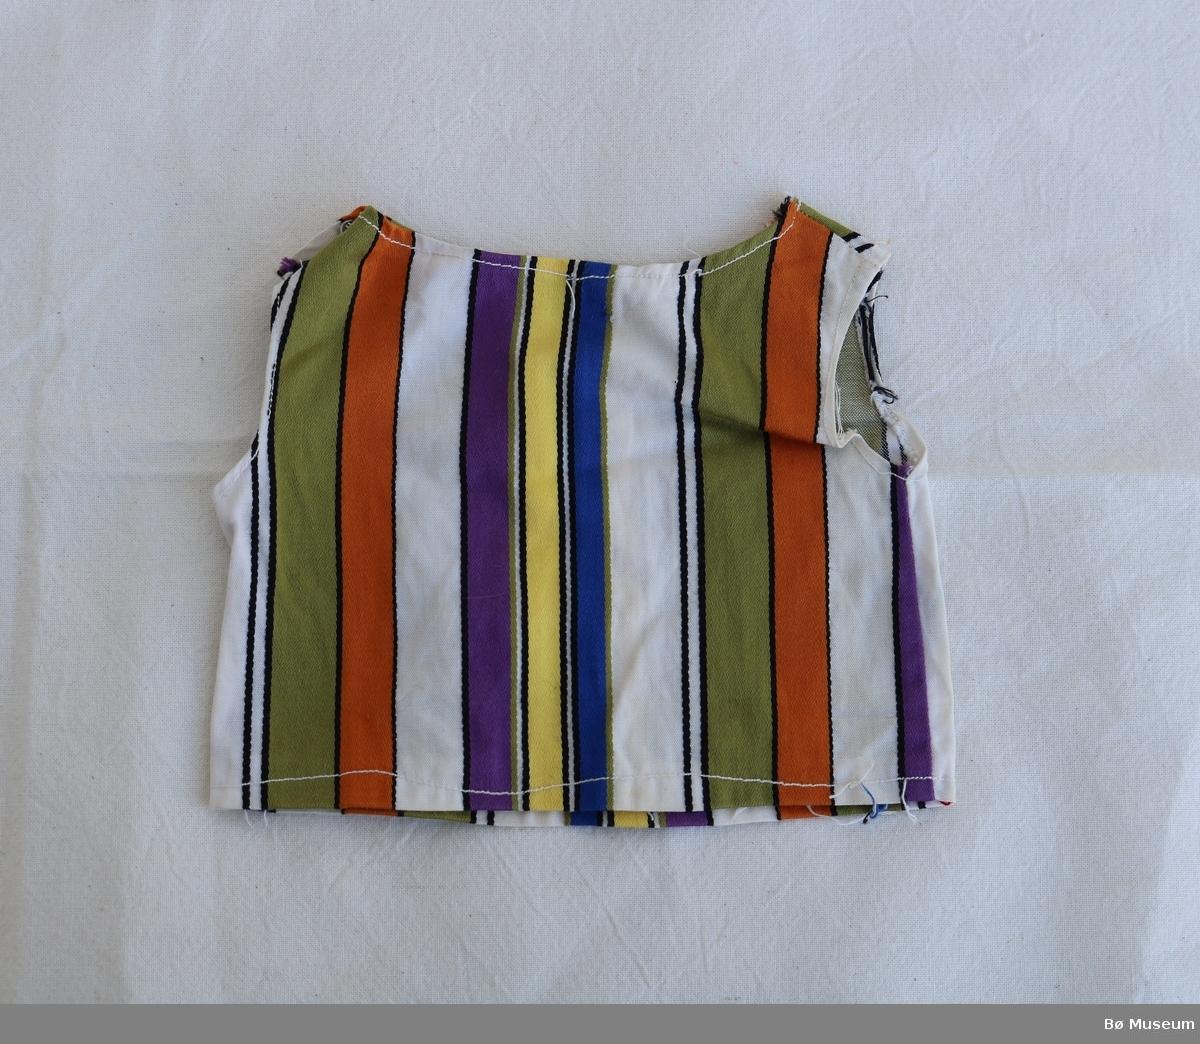 Bluse til dokke med lomme på magen og to trykknappar på venstre skuldere. Utan armar. Noko ujamn saum i fall nede , rundt armane og i halsen. Blusa er sauma i eit stripete stoff. Stripene har ulik breidde og fargar.